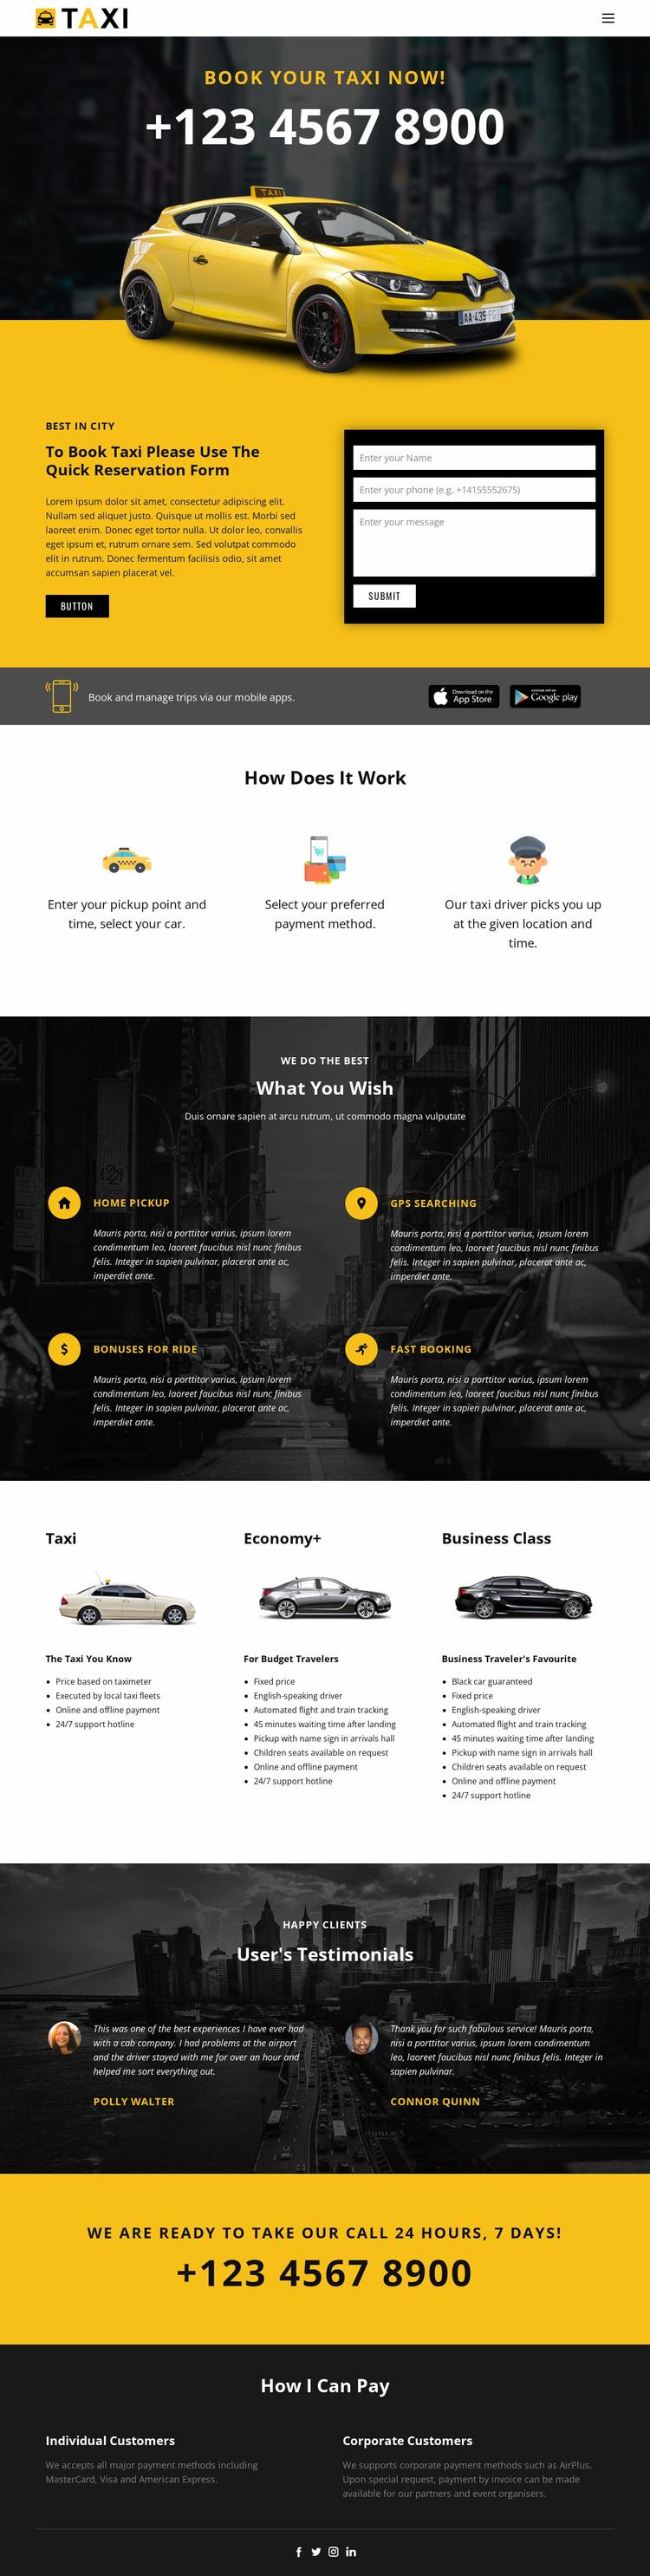 Fastest taxi cars Website Design